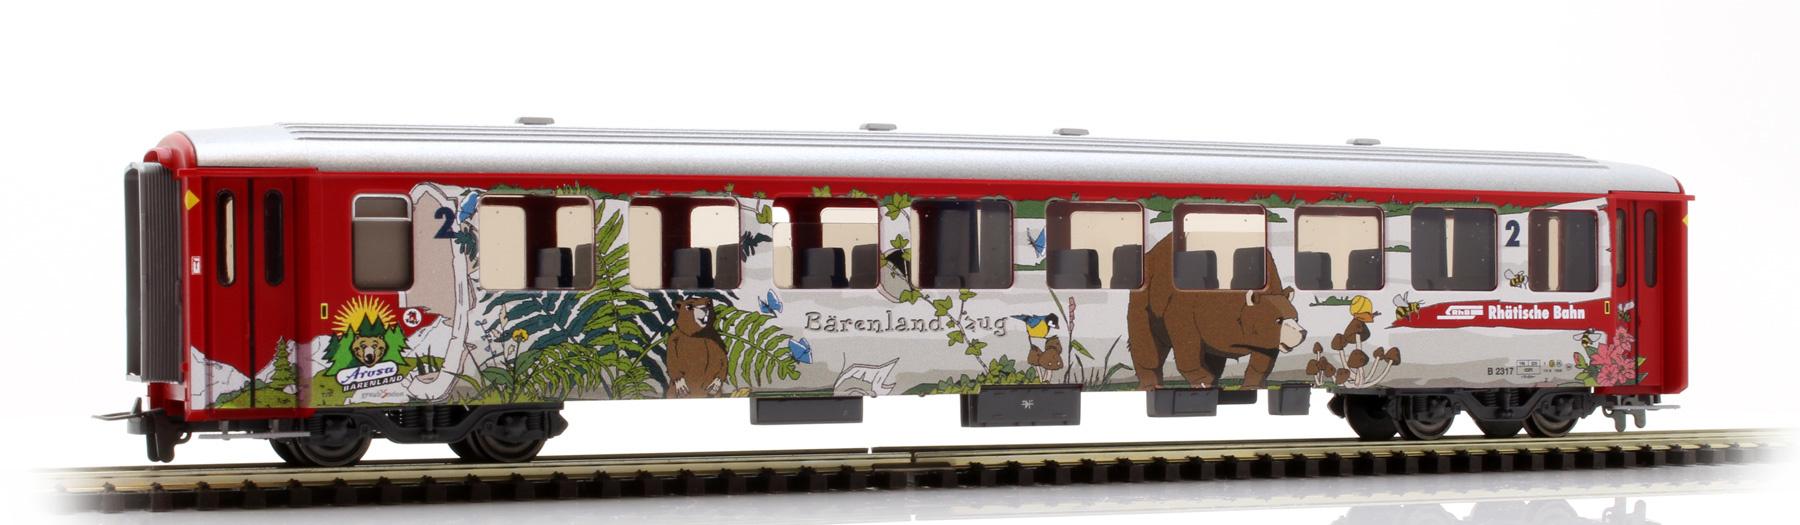 "3253147 RhB B 2317 EW I ""Bärenland Arosa""-1"